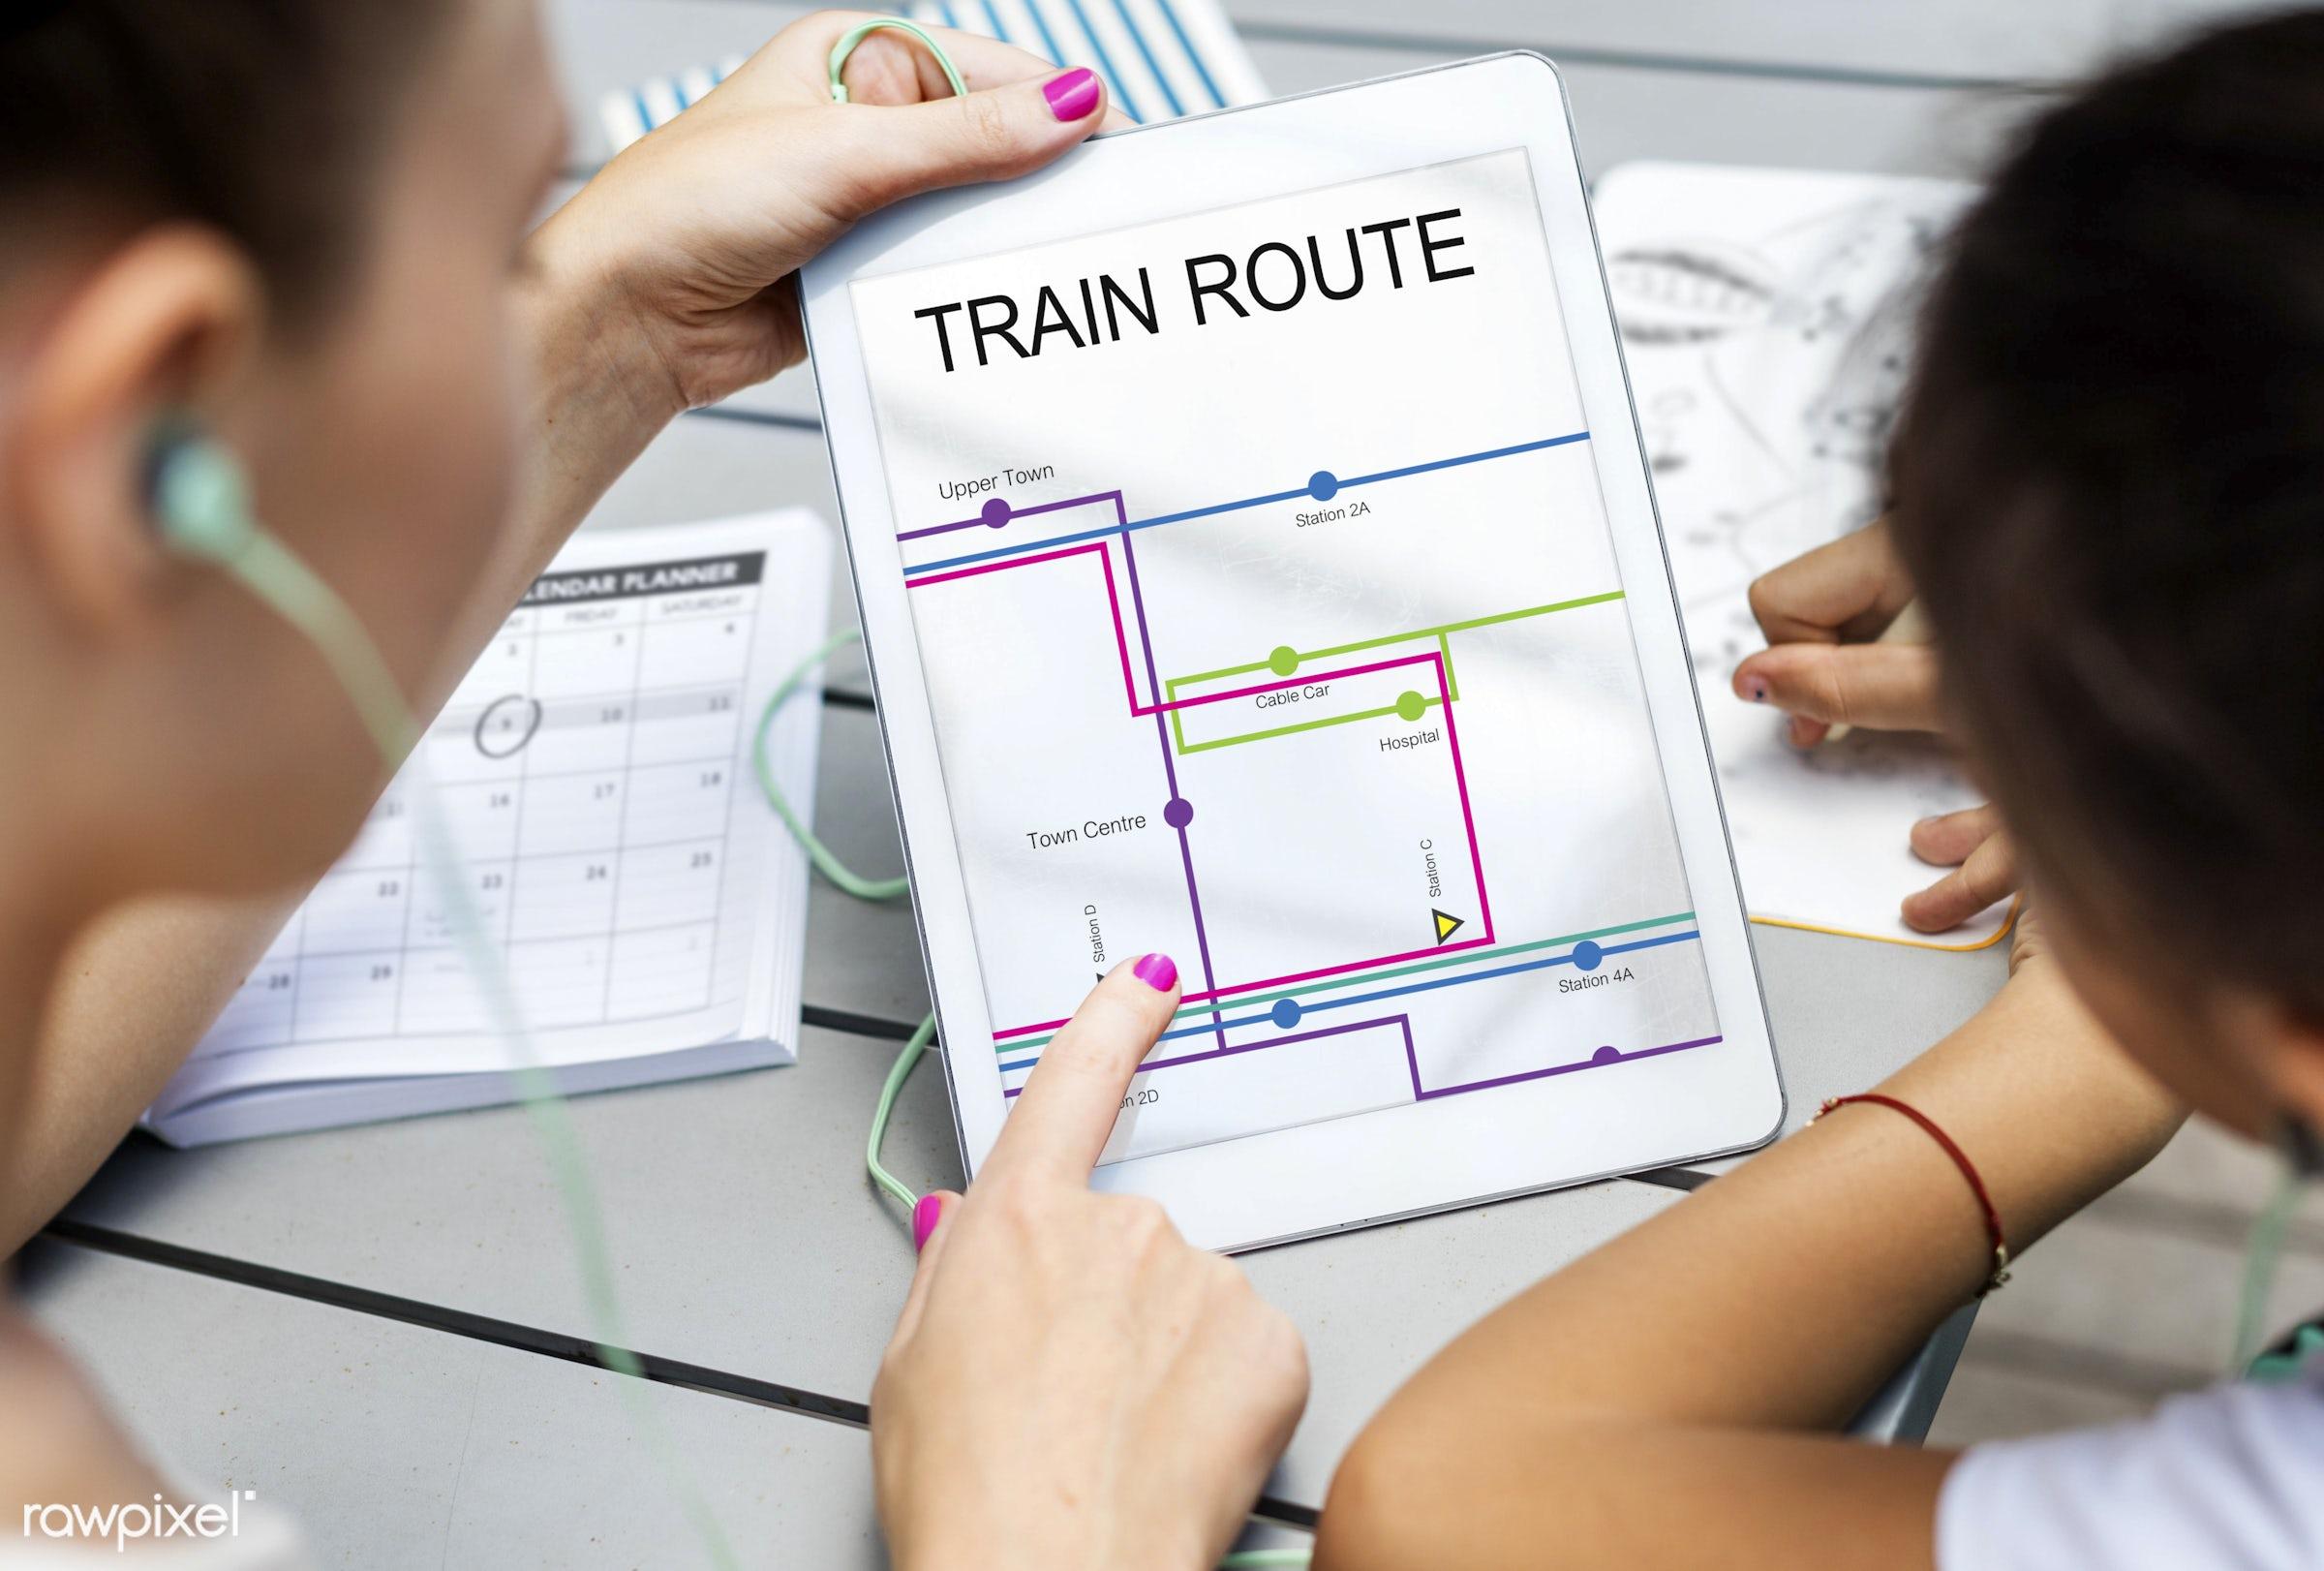 aganda, assistance, bus, bus route, calendar, destination, digital, digital device, digital tablet, direction, discovery,...